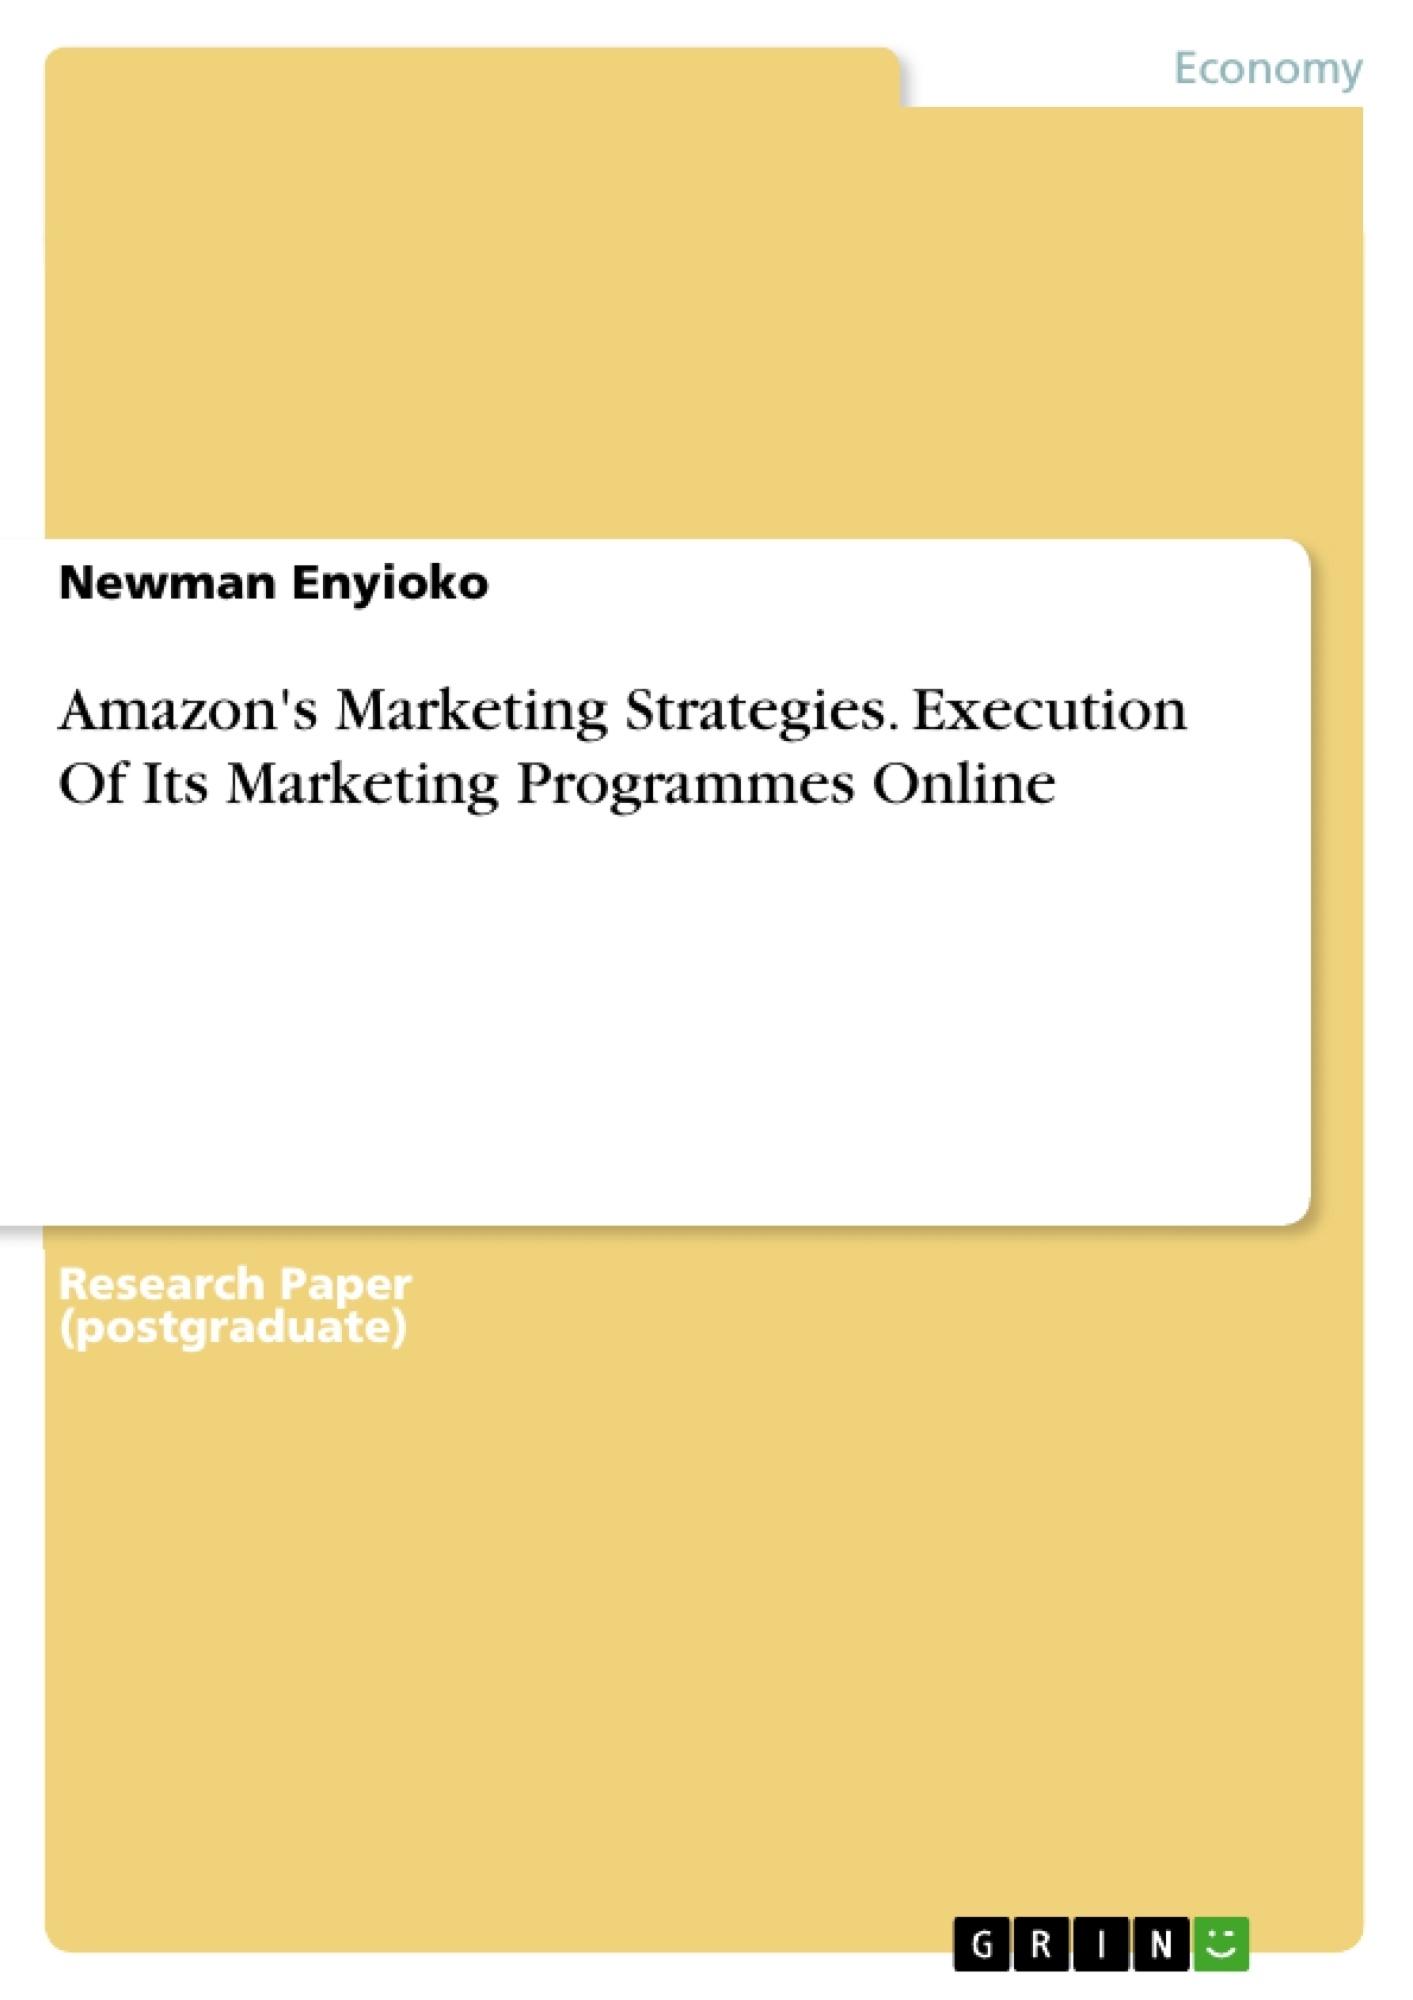 Title: Amazon's Marketing Strategies. Execution Of Its Marketing Programmes Online